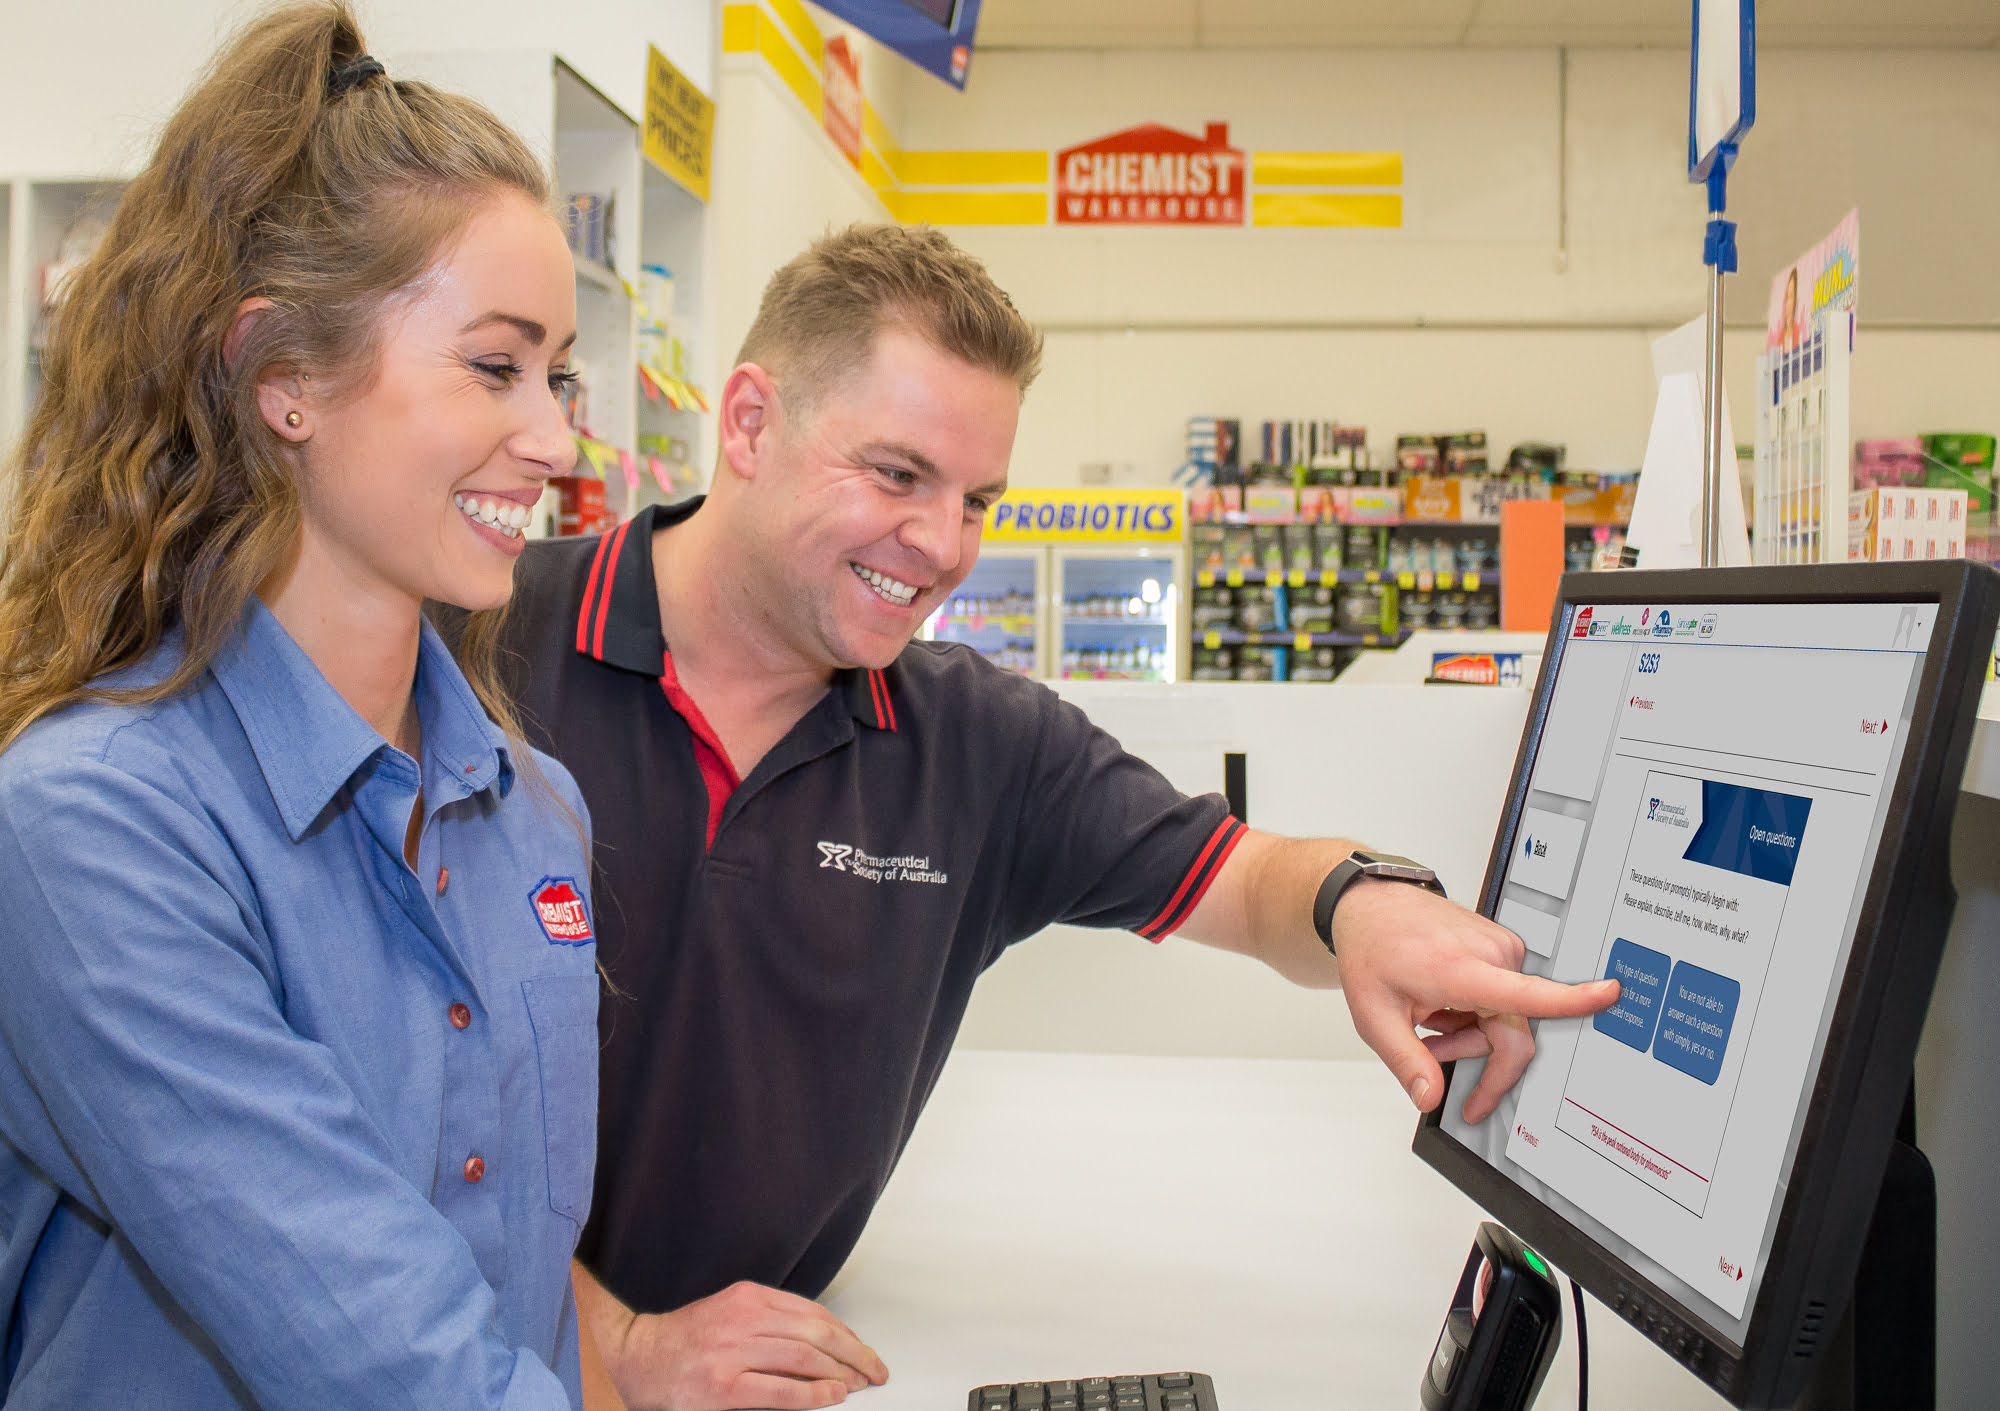 Chemist Warehouse employee Laura and PSA trainer Ryan discuss the new online training platform.